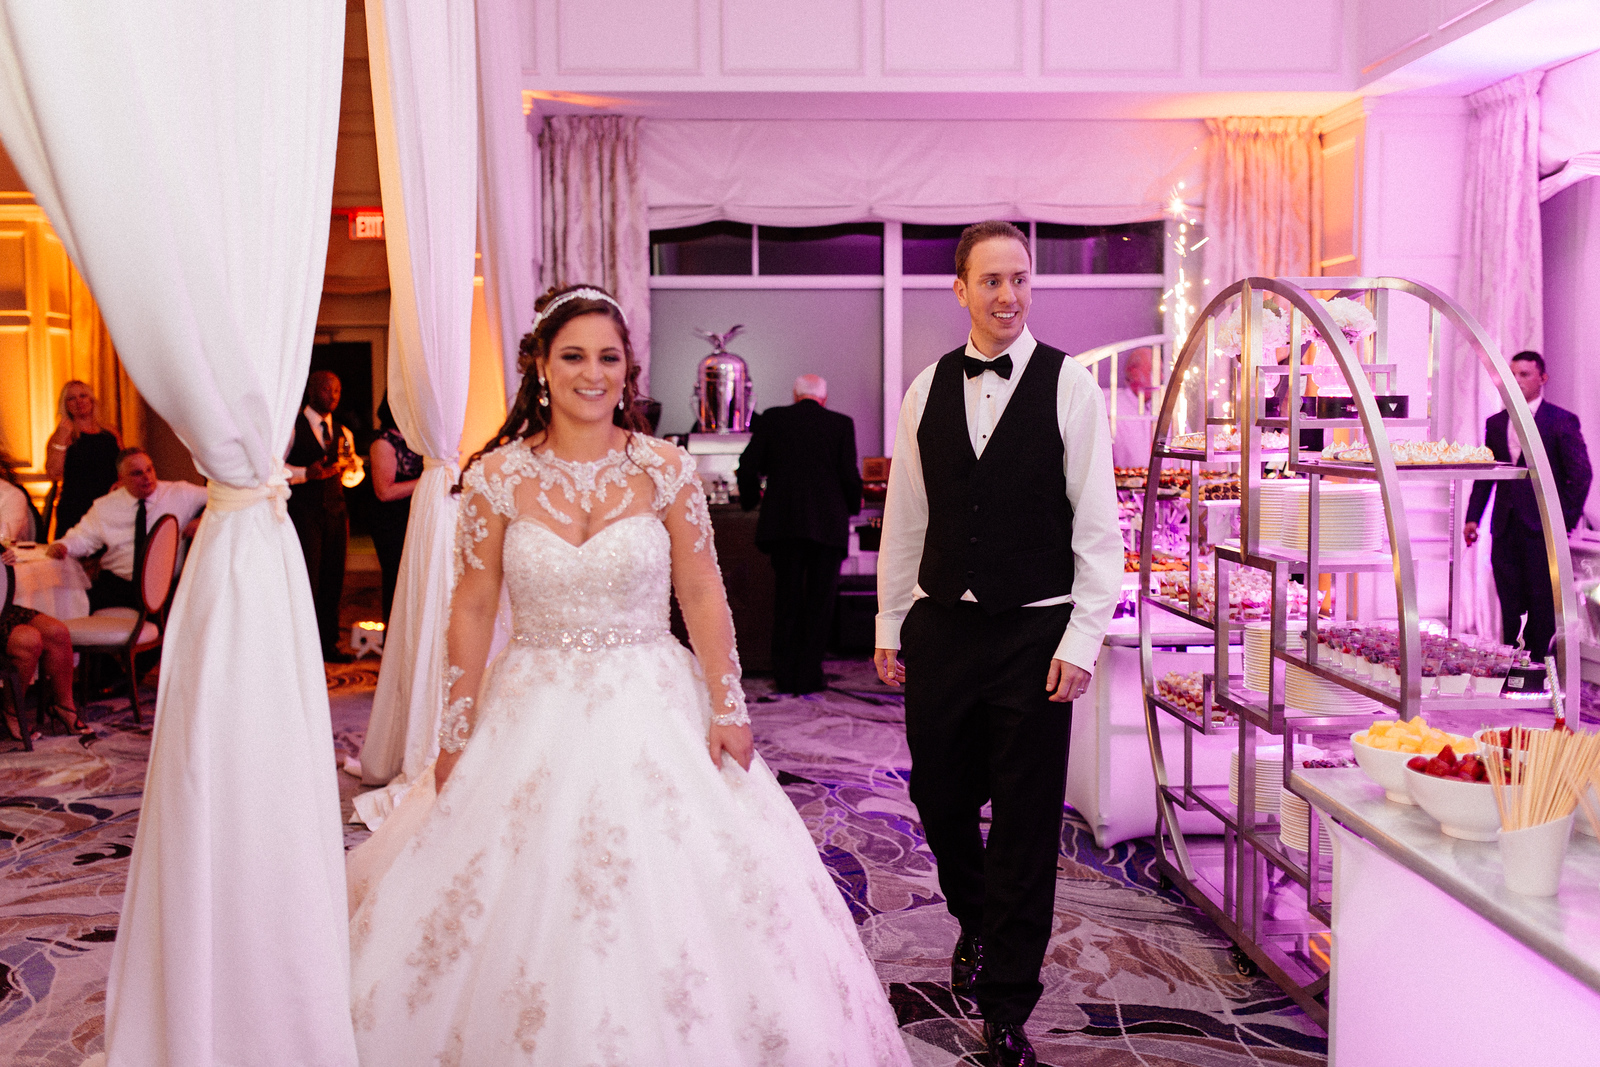 South-Florida-Wedding-Photographer-Andreo-5D3_5459